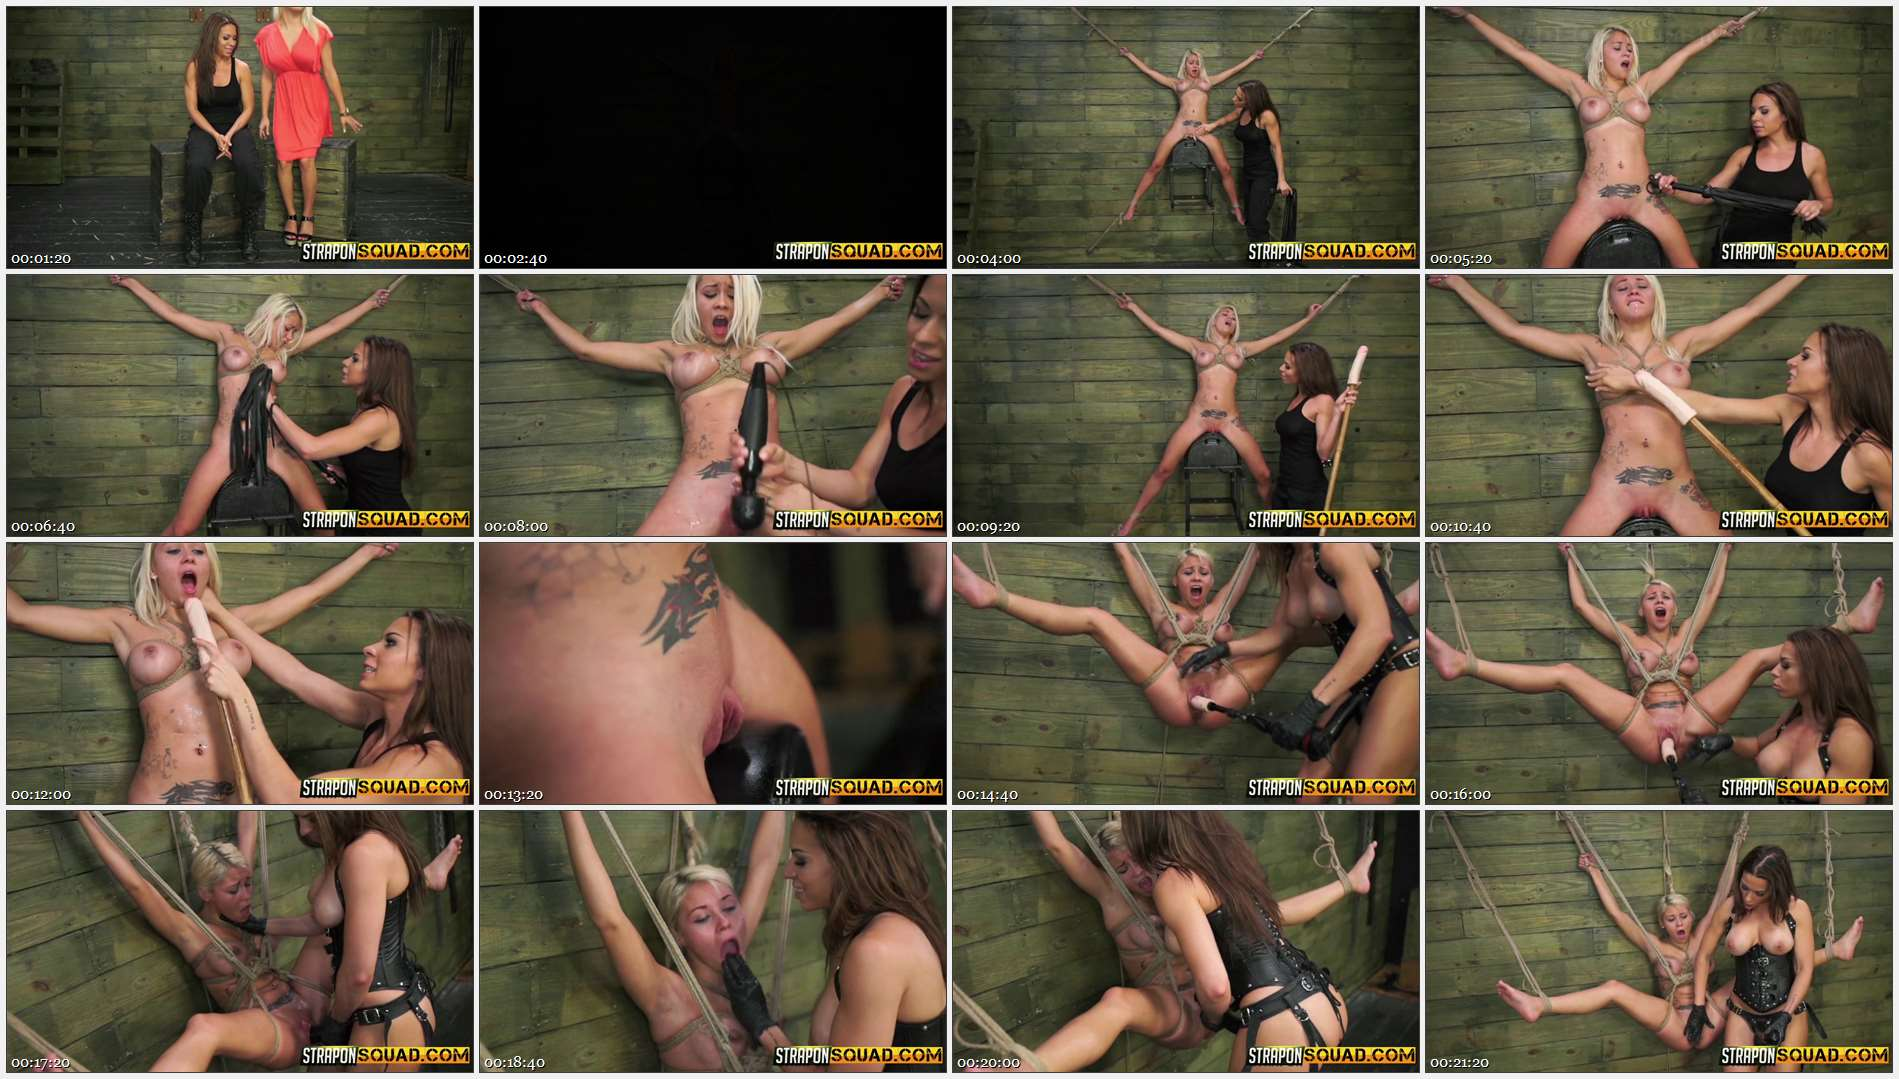 Marsha May – Marsha May Endures Lesbian Rope Bondage with Kylie Rogue